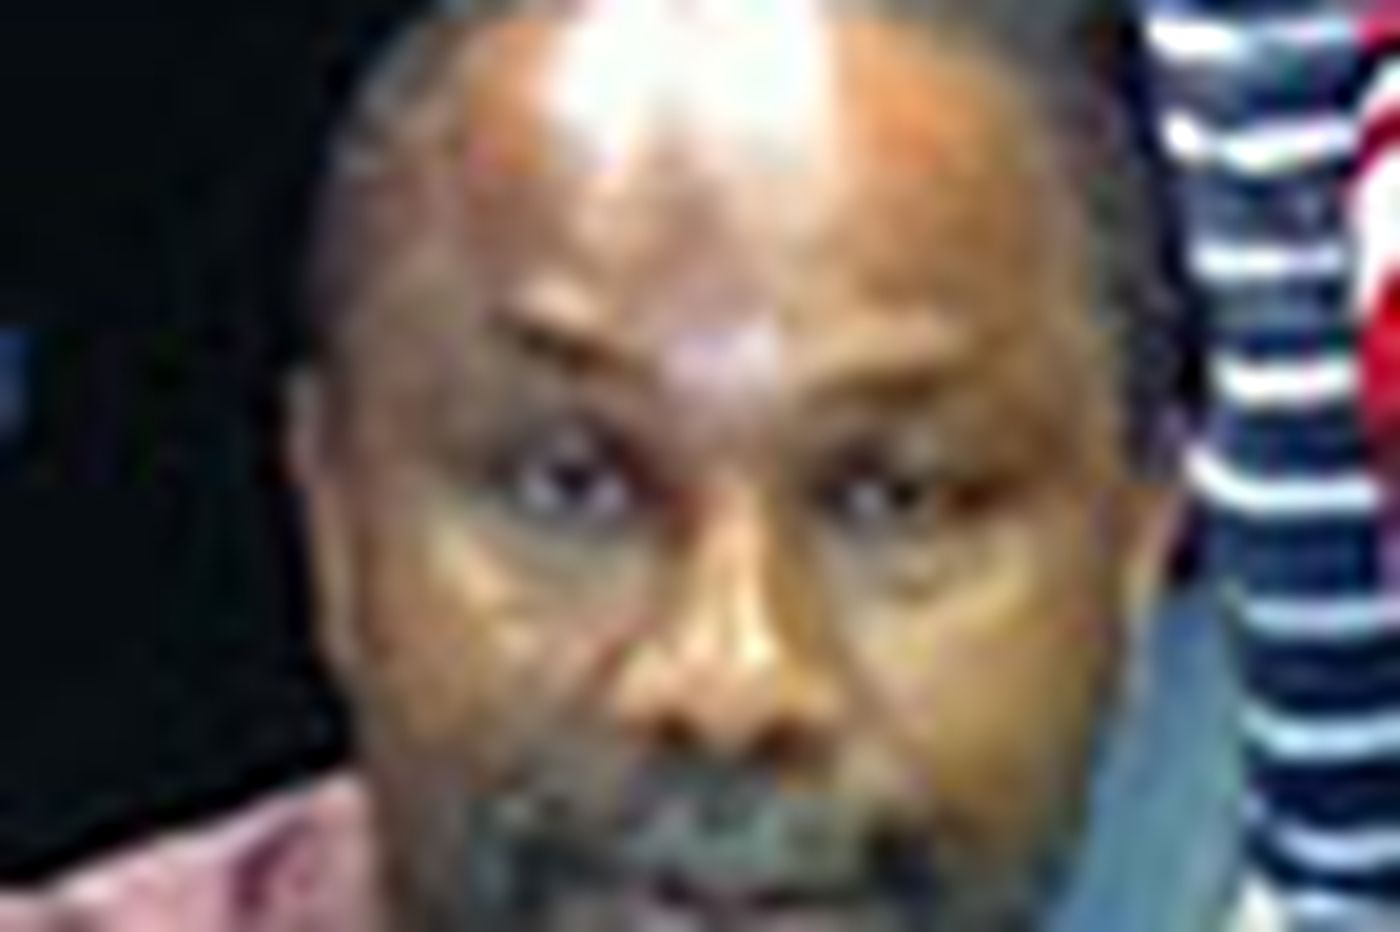 Juvenile lifers have until Friday to appeal sentences